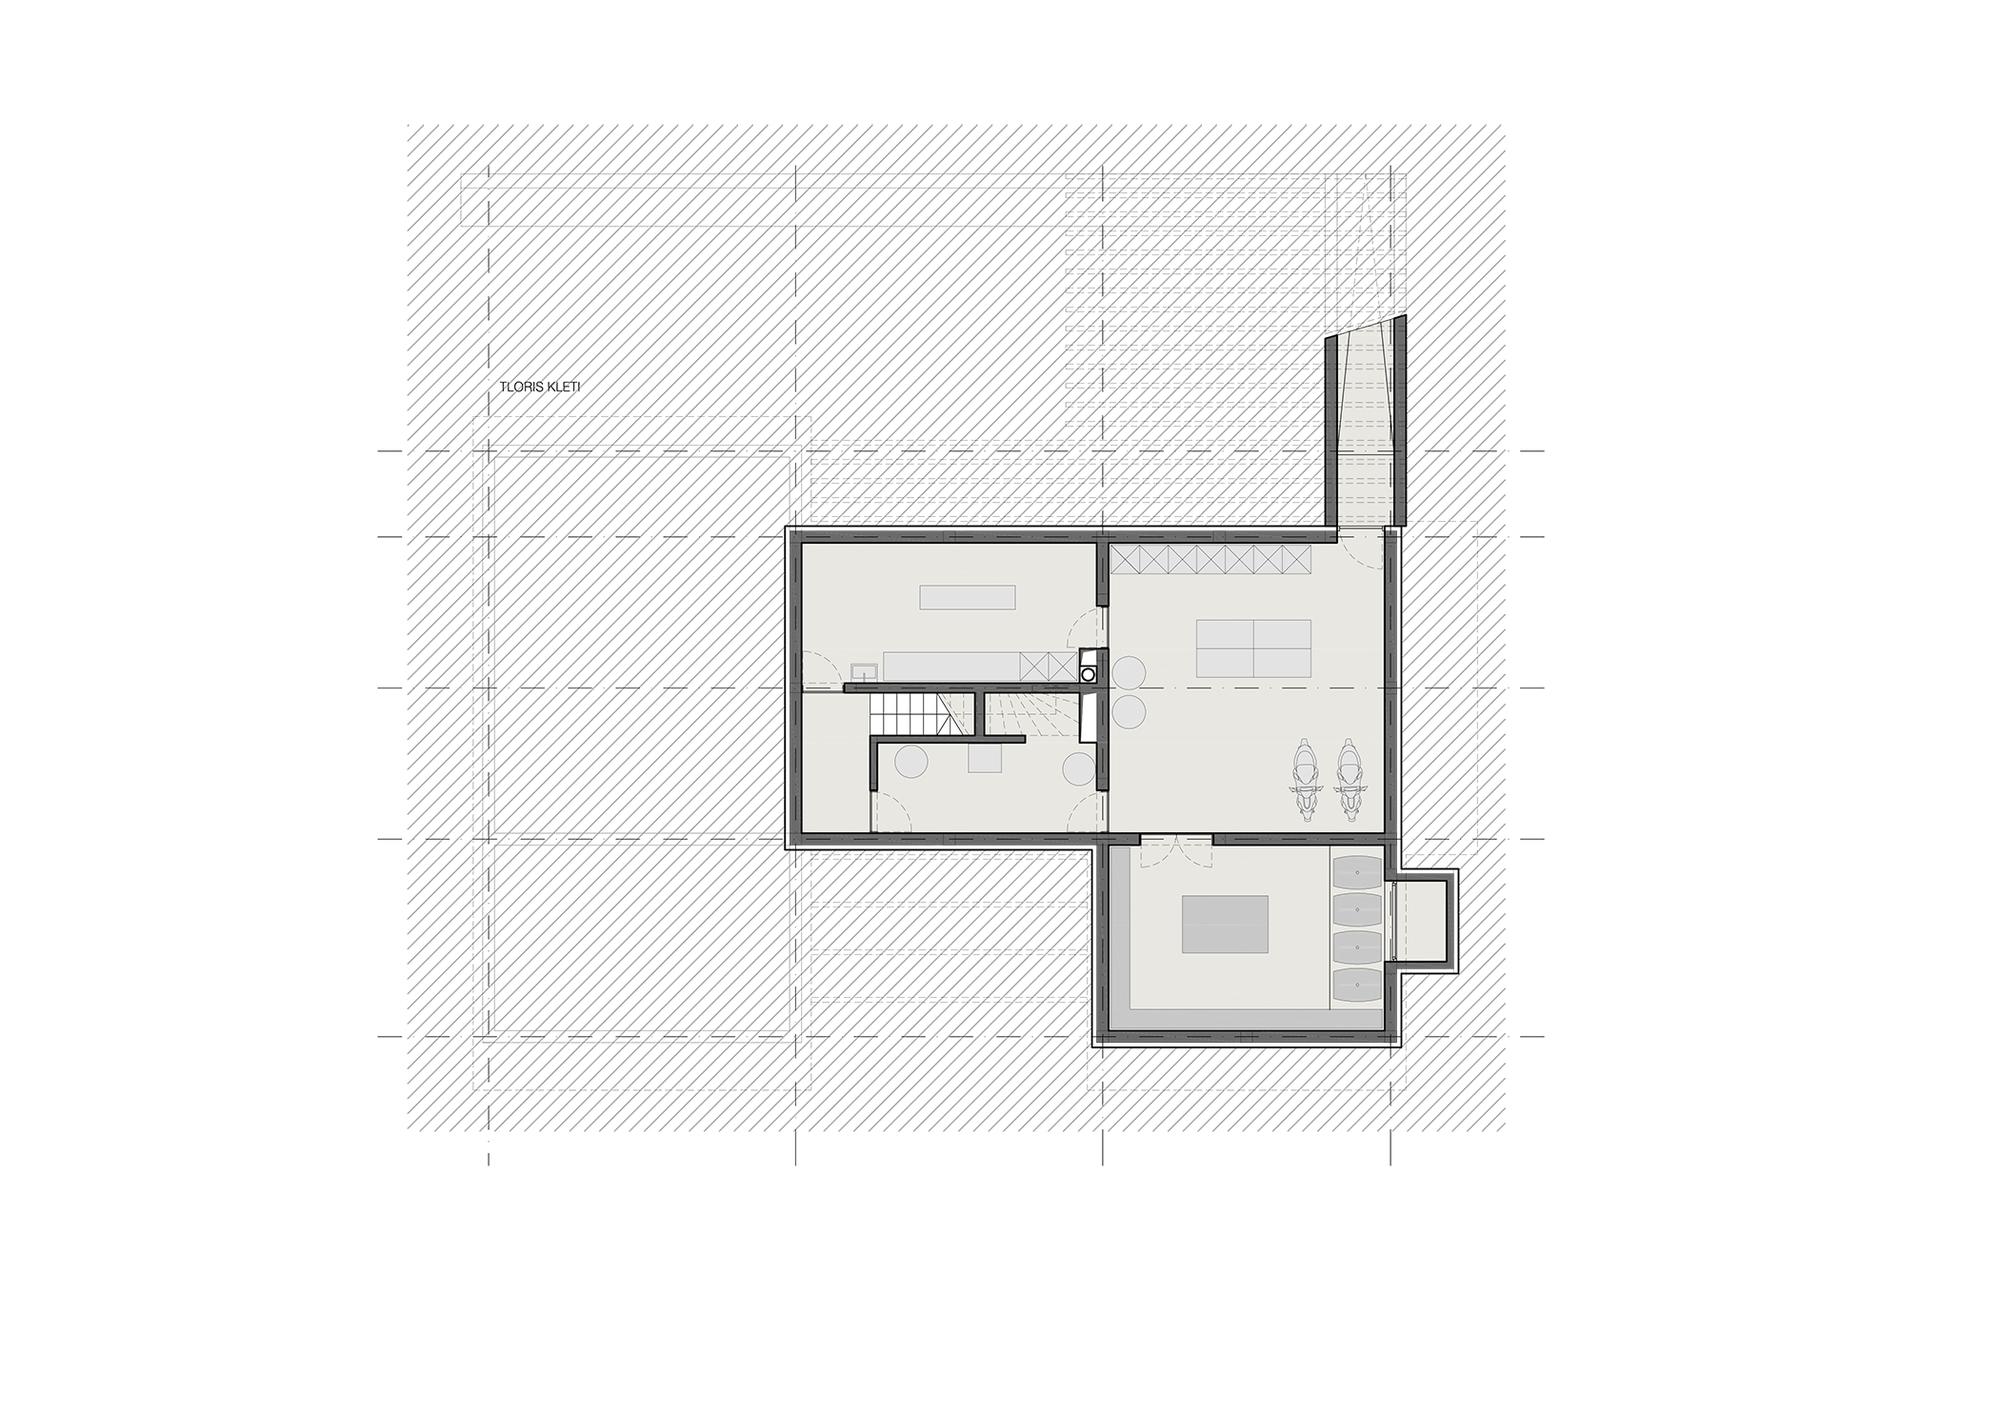 Galeria de Casa XL / SoNo Arhitekti - 20